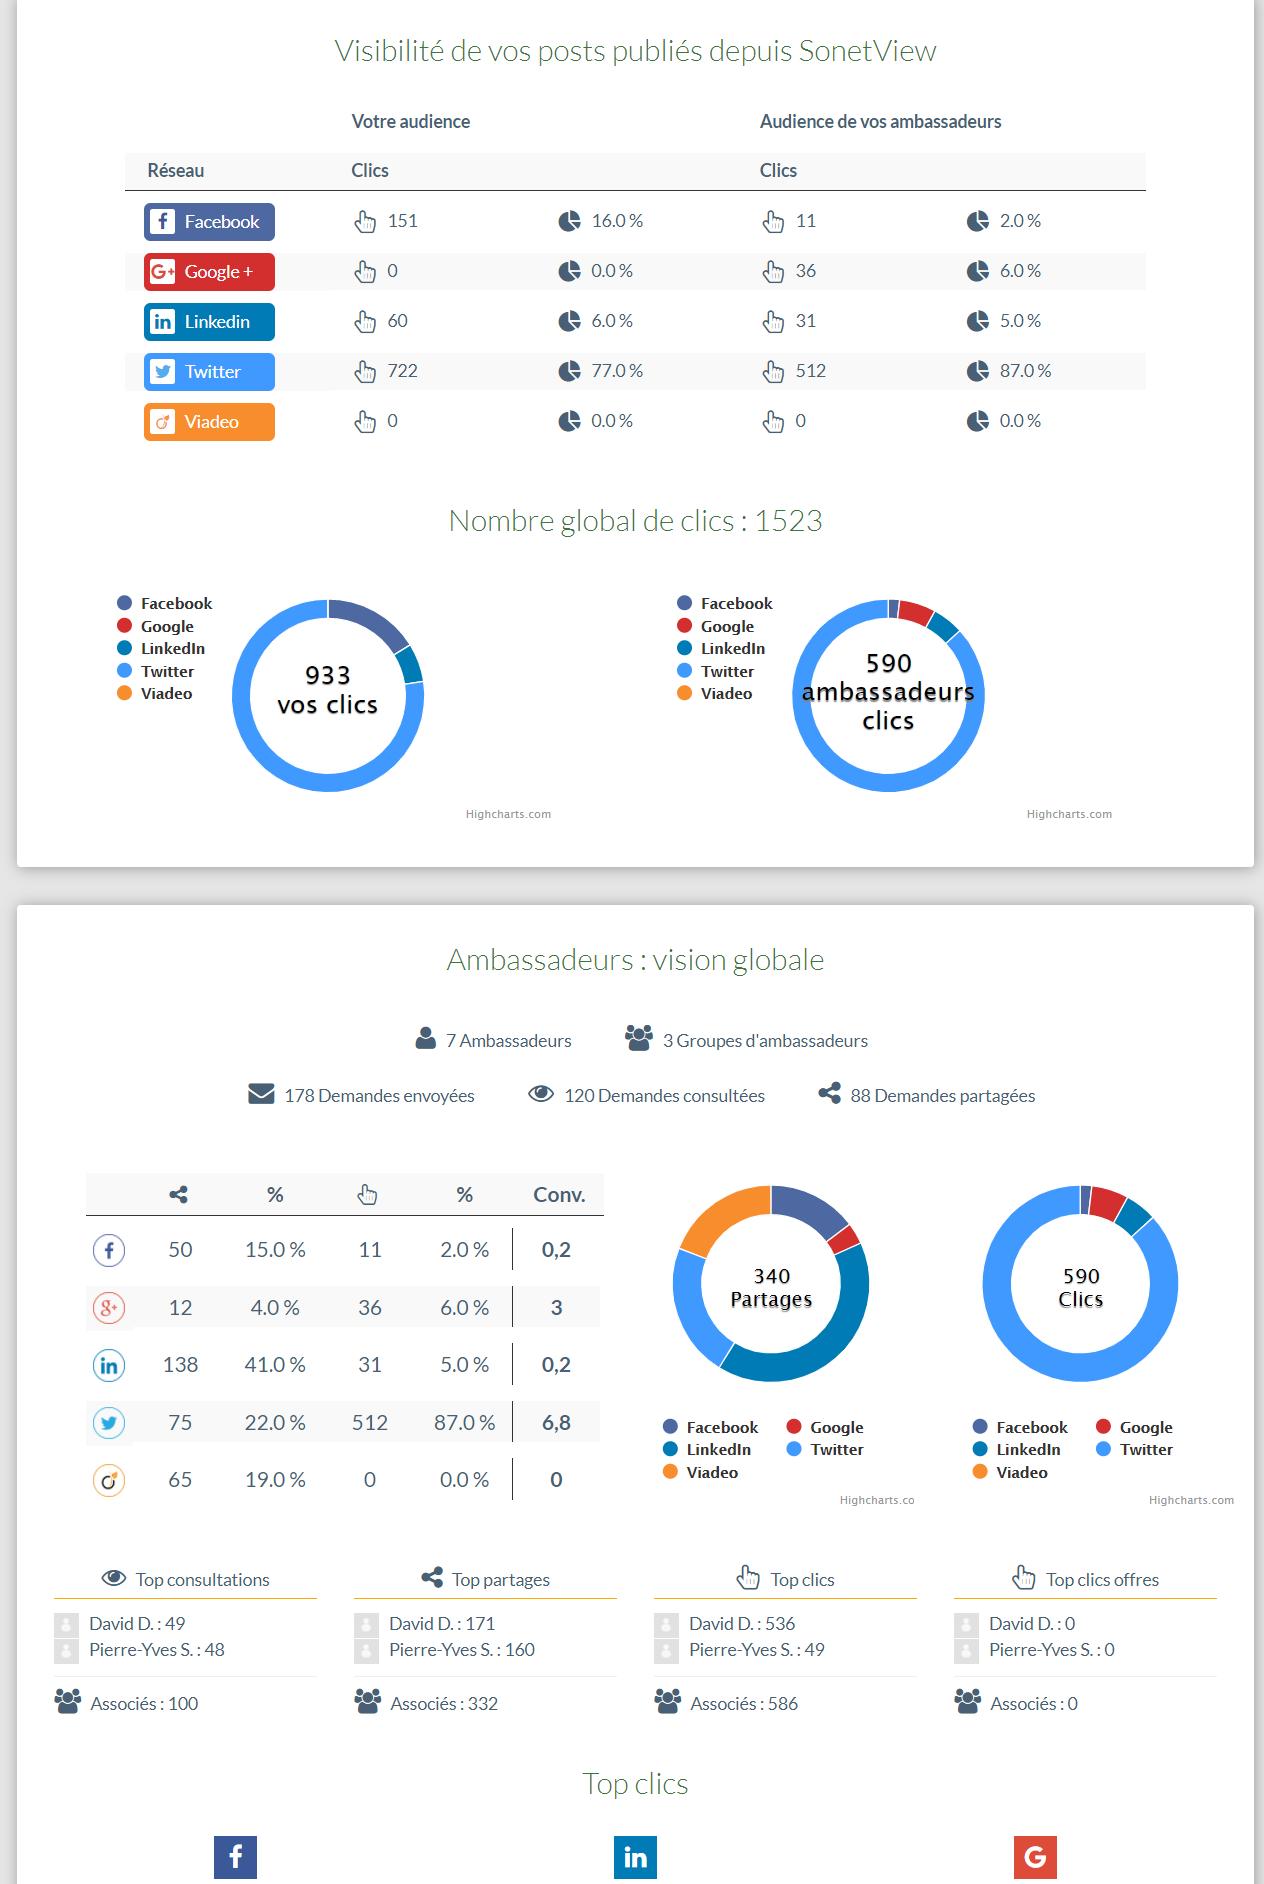 Rapport analytique des posts